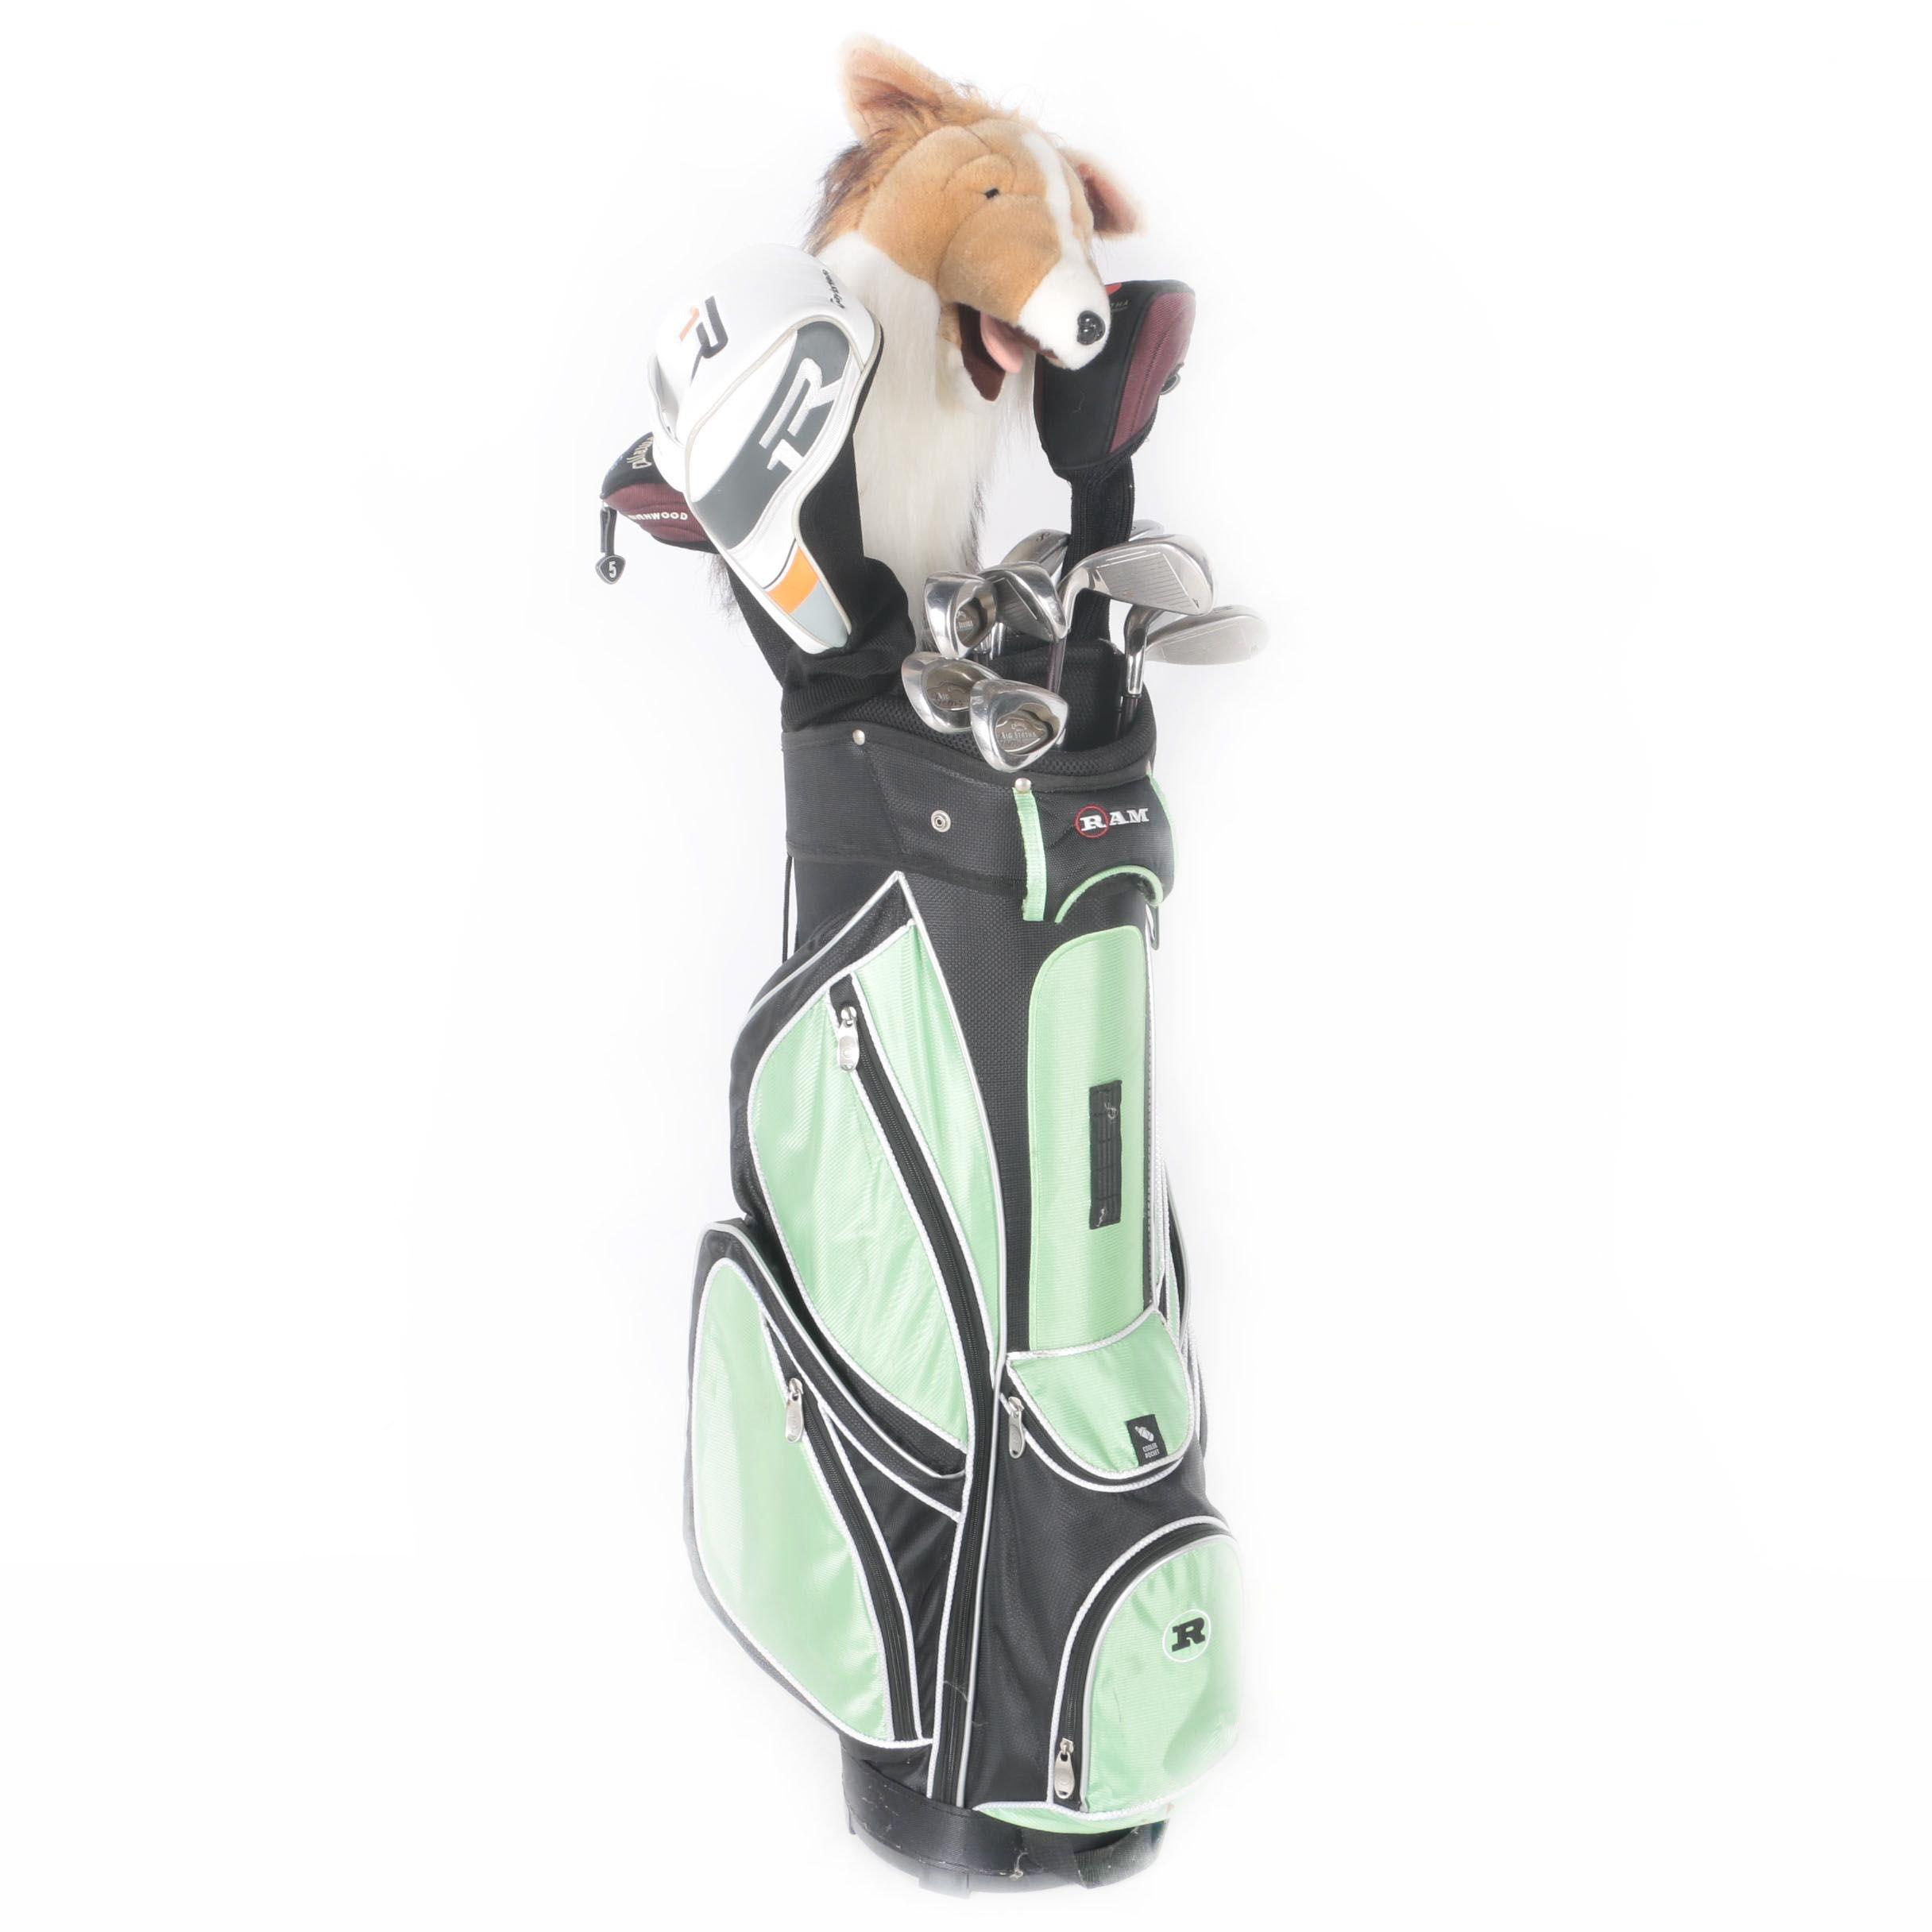 Golf Clubs Including Callaway with RAM Golf Bag